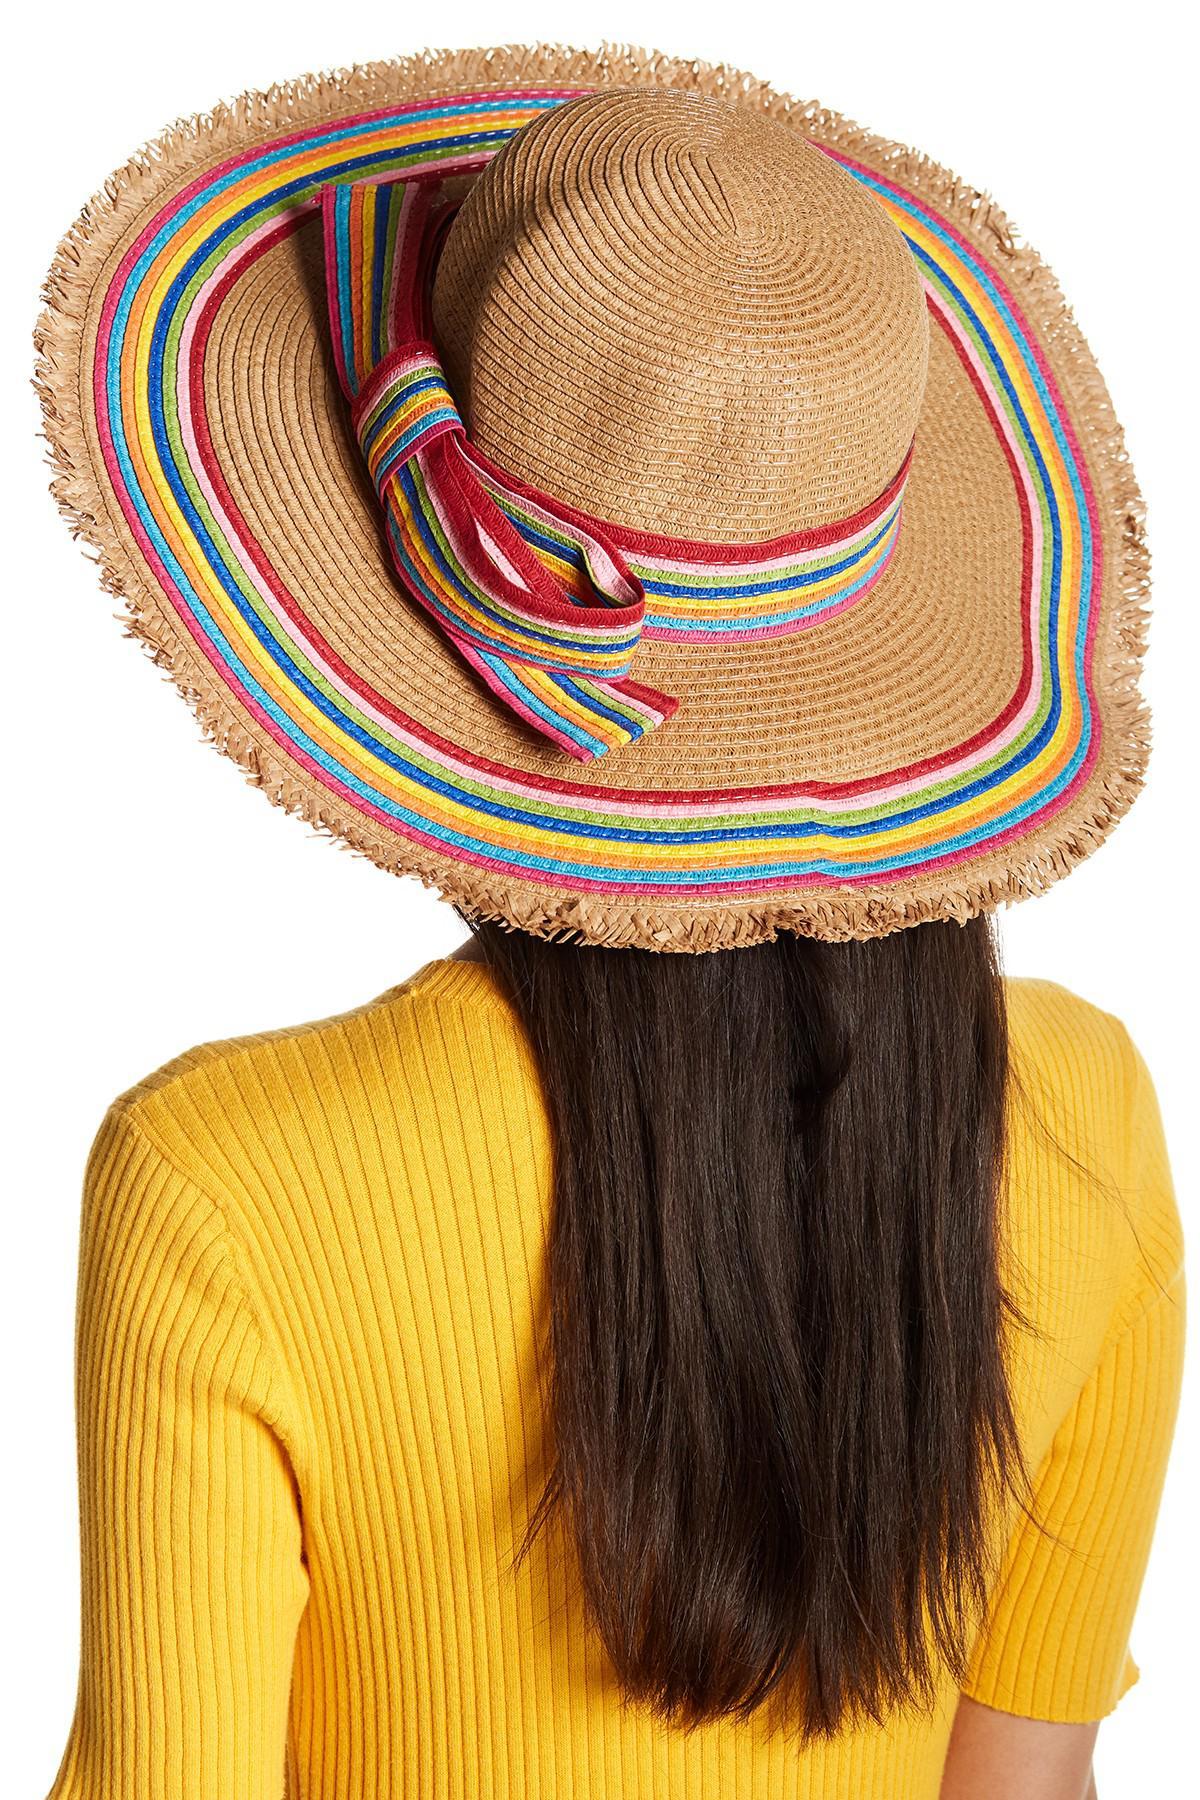 52c2bec868 Lyst - Betsey Johnson Rainbow Raw Edge Floppy Hat